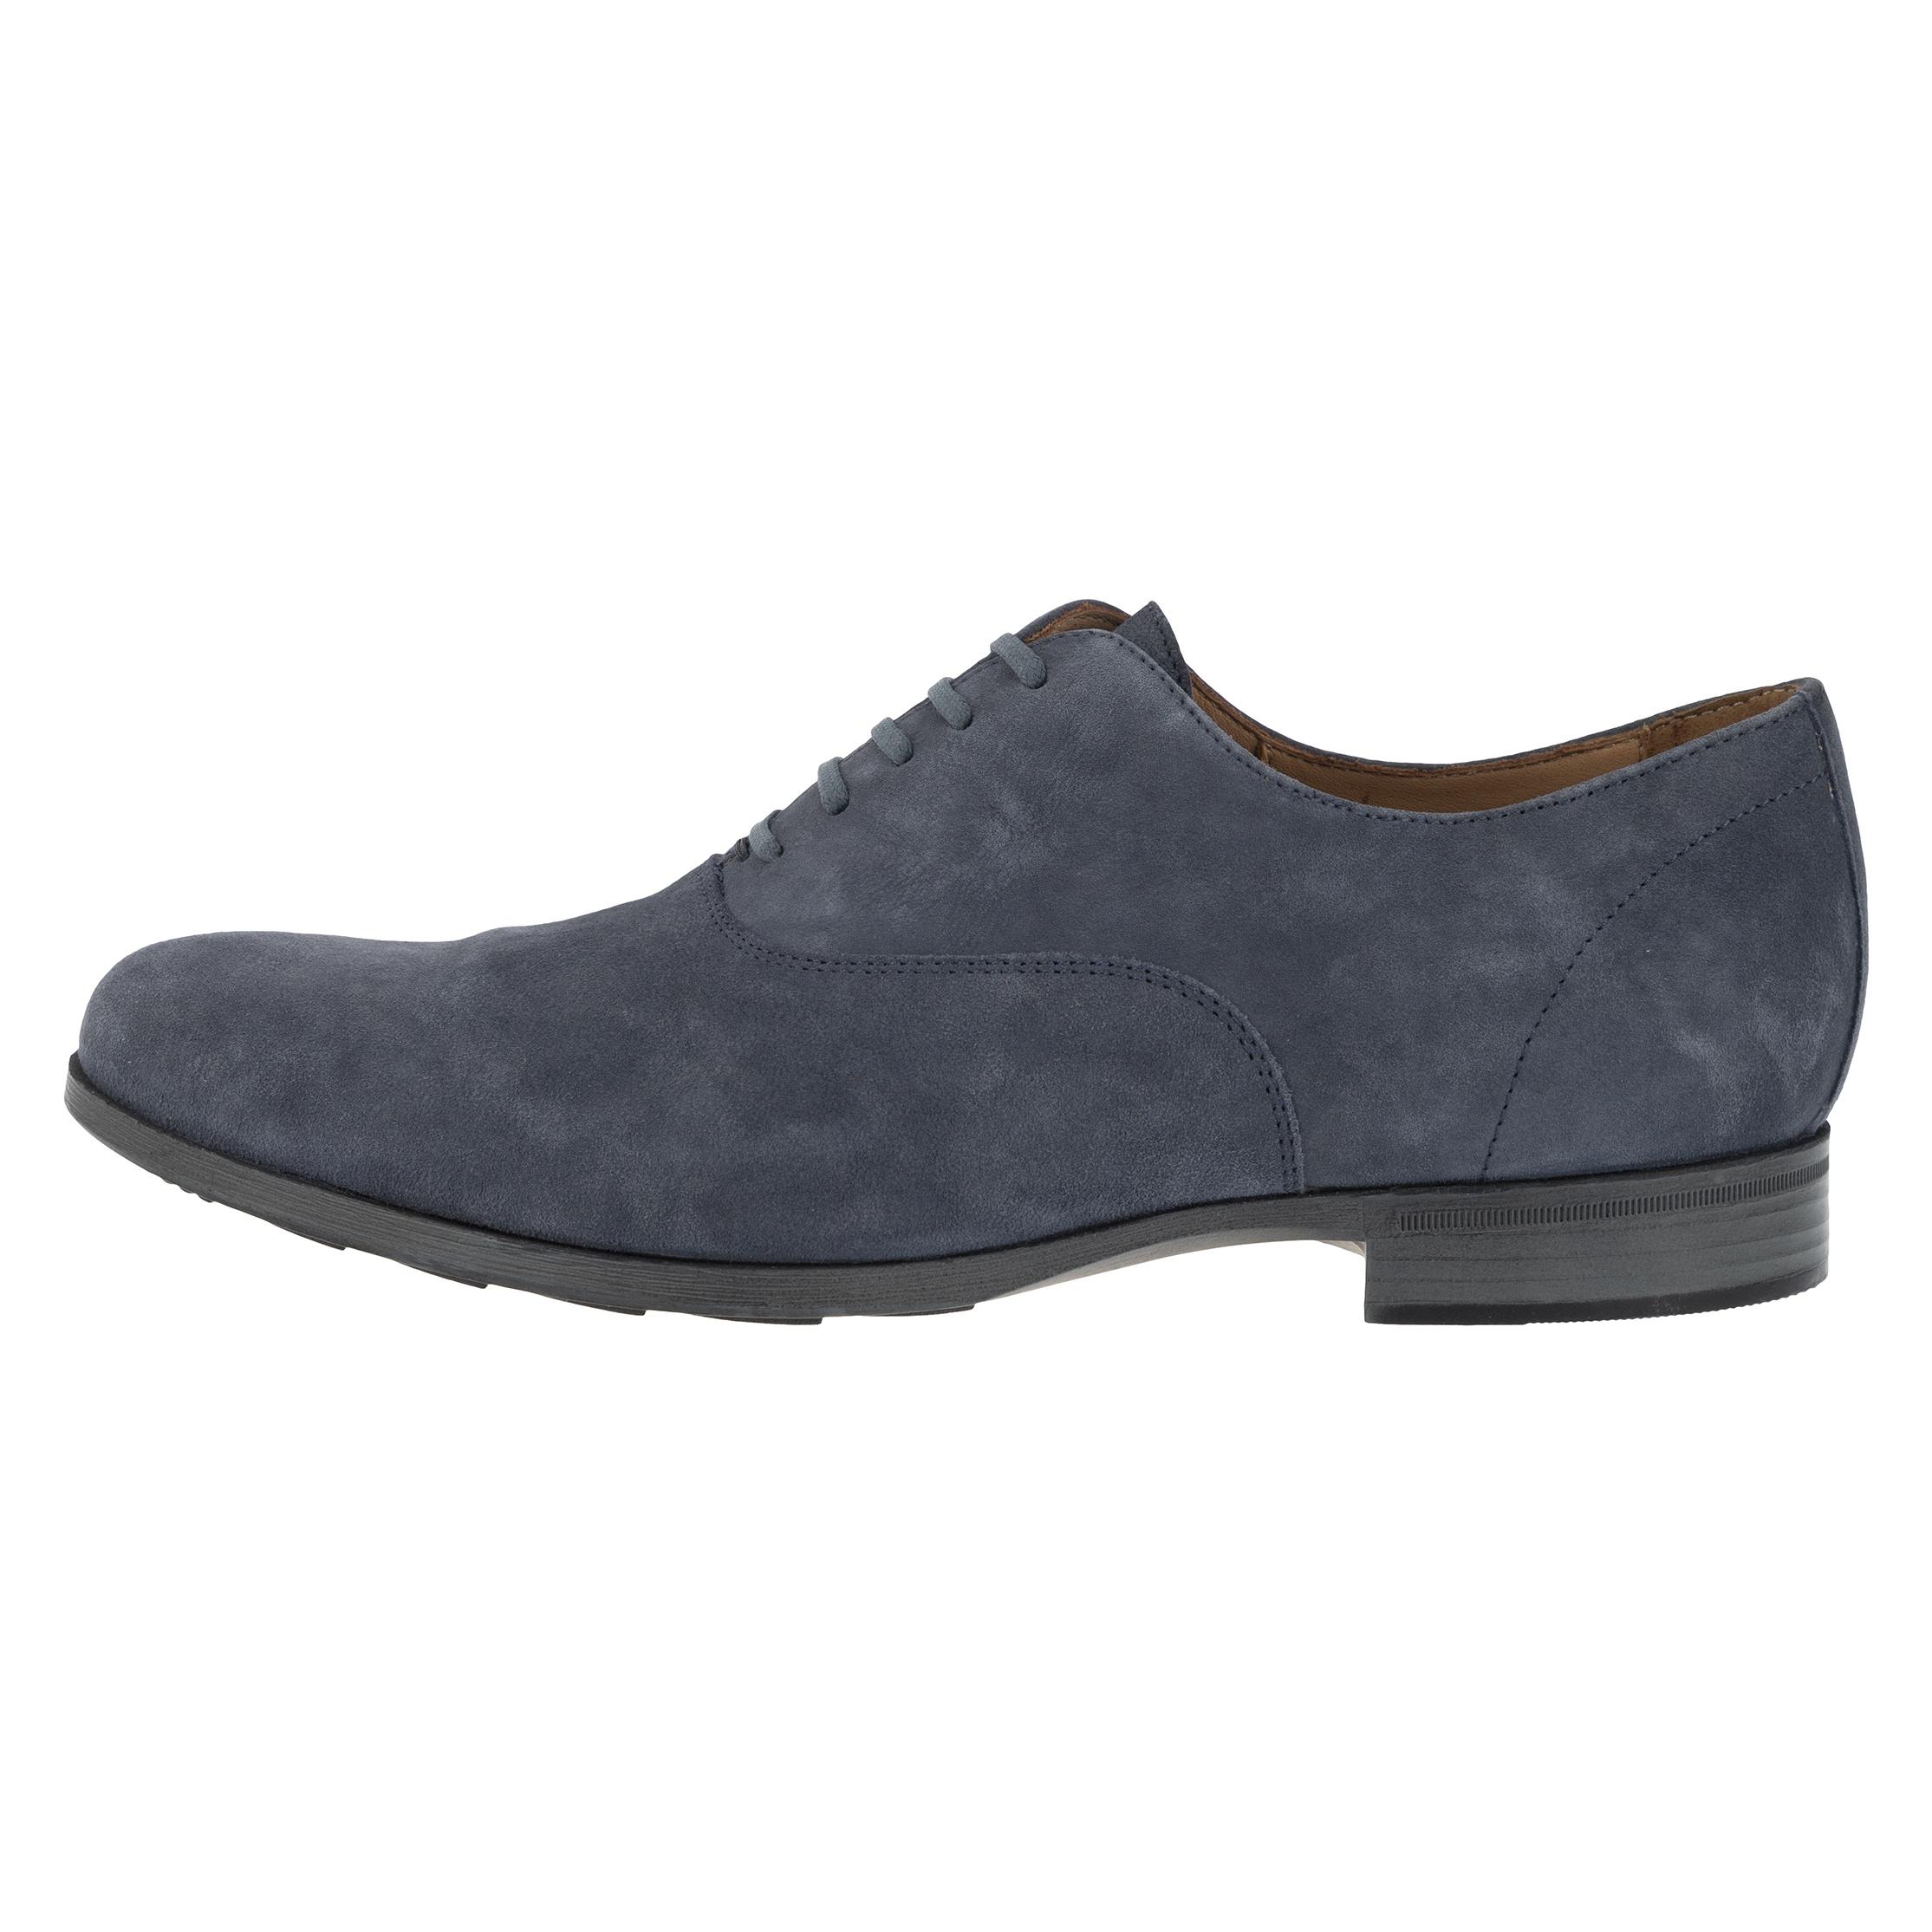 کفش مردانه جی اوکس مدل U721XB-000ZR-C4343